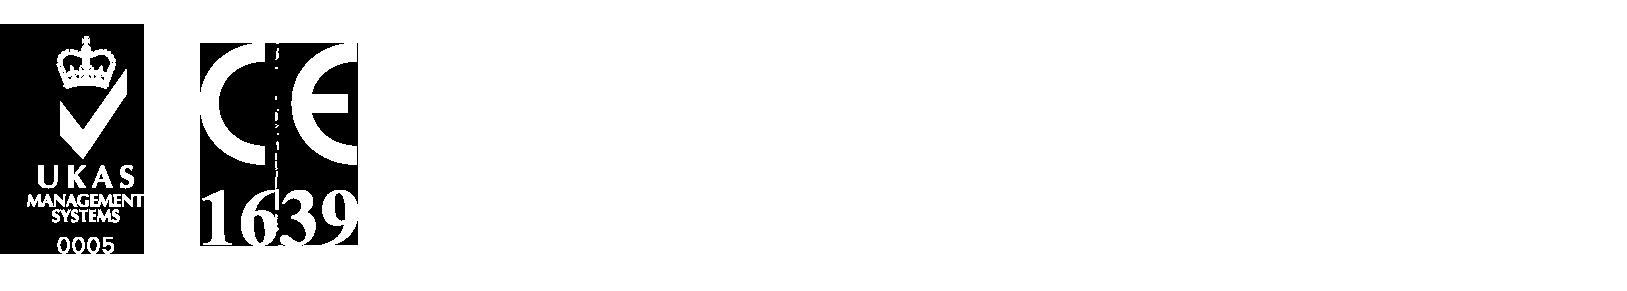 logos footer 2021